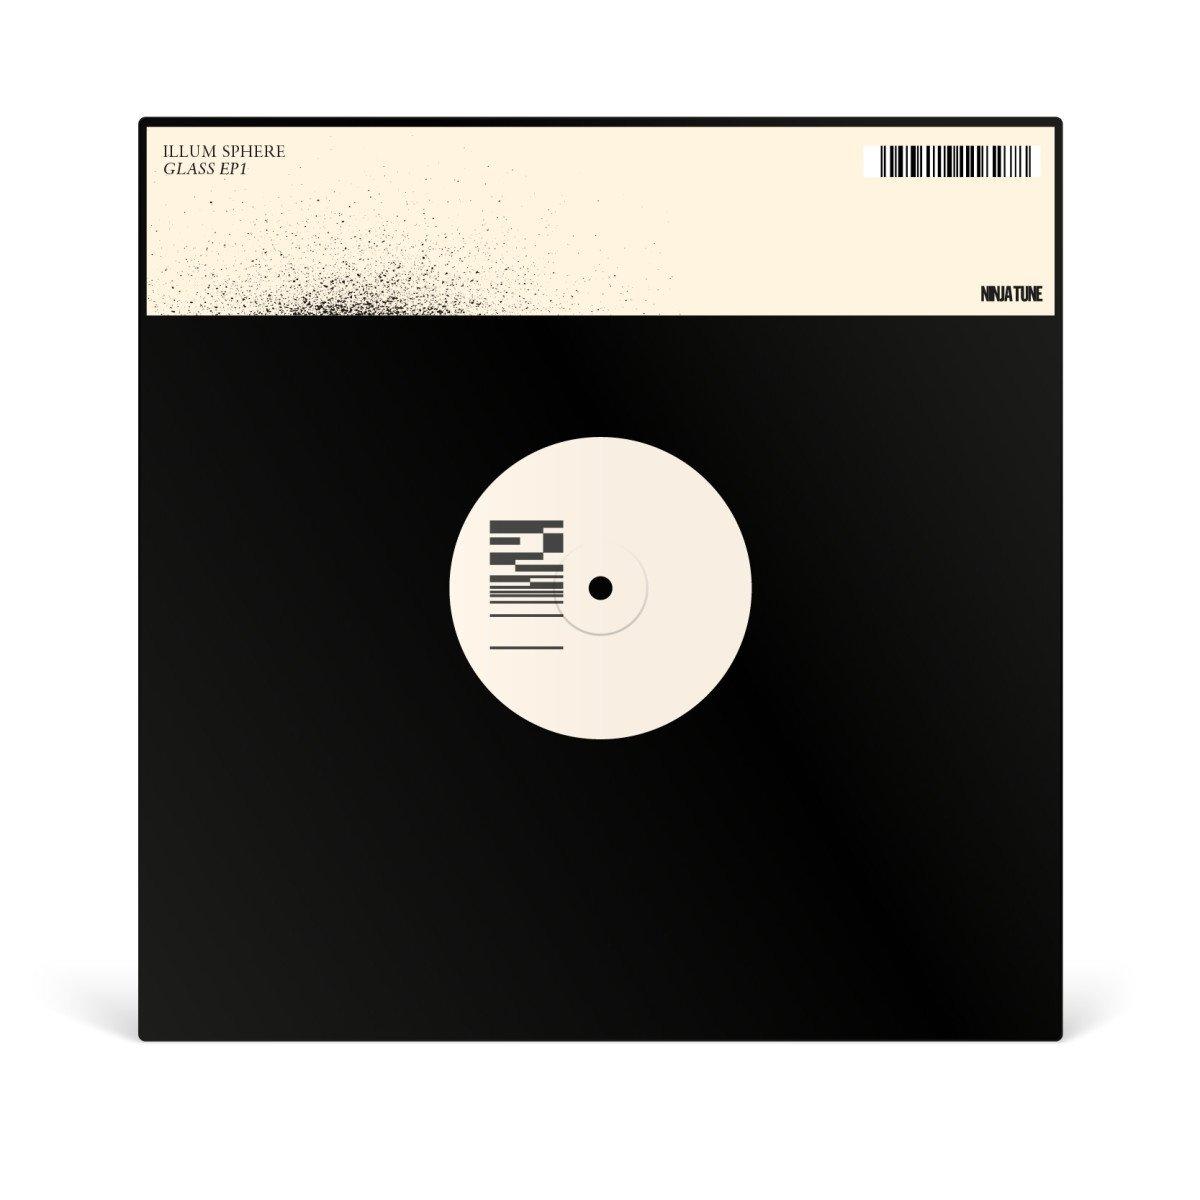 ILLUM SPHERE - Glass EP1 - Amazon.com Music